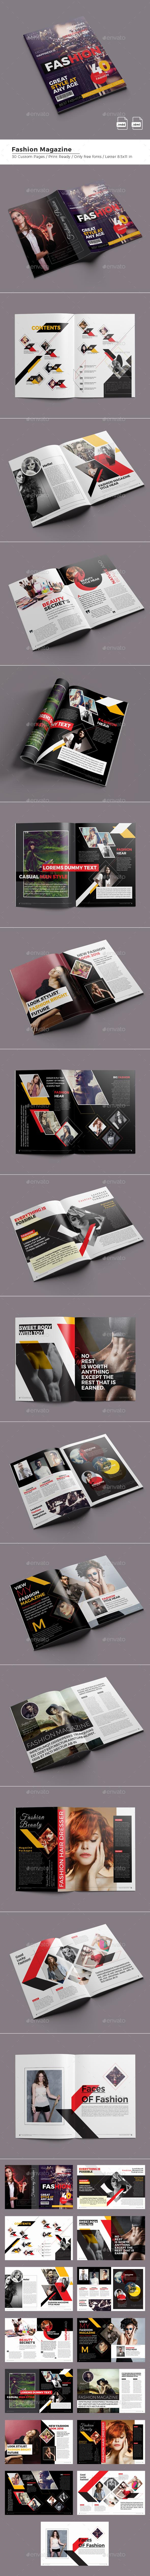 Fashion Magazine - Magazines Print Templates